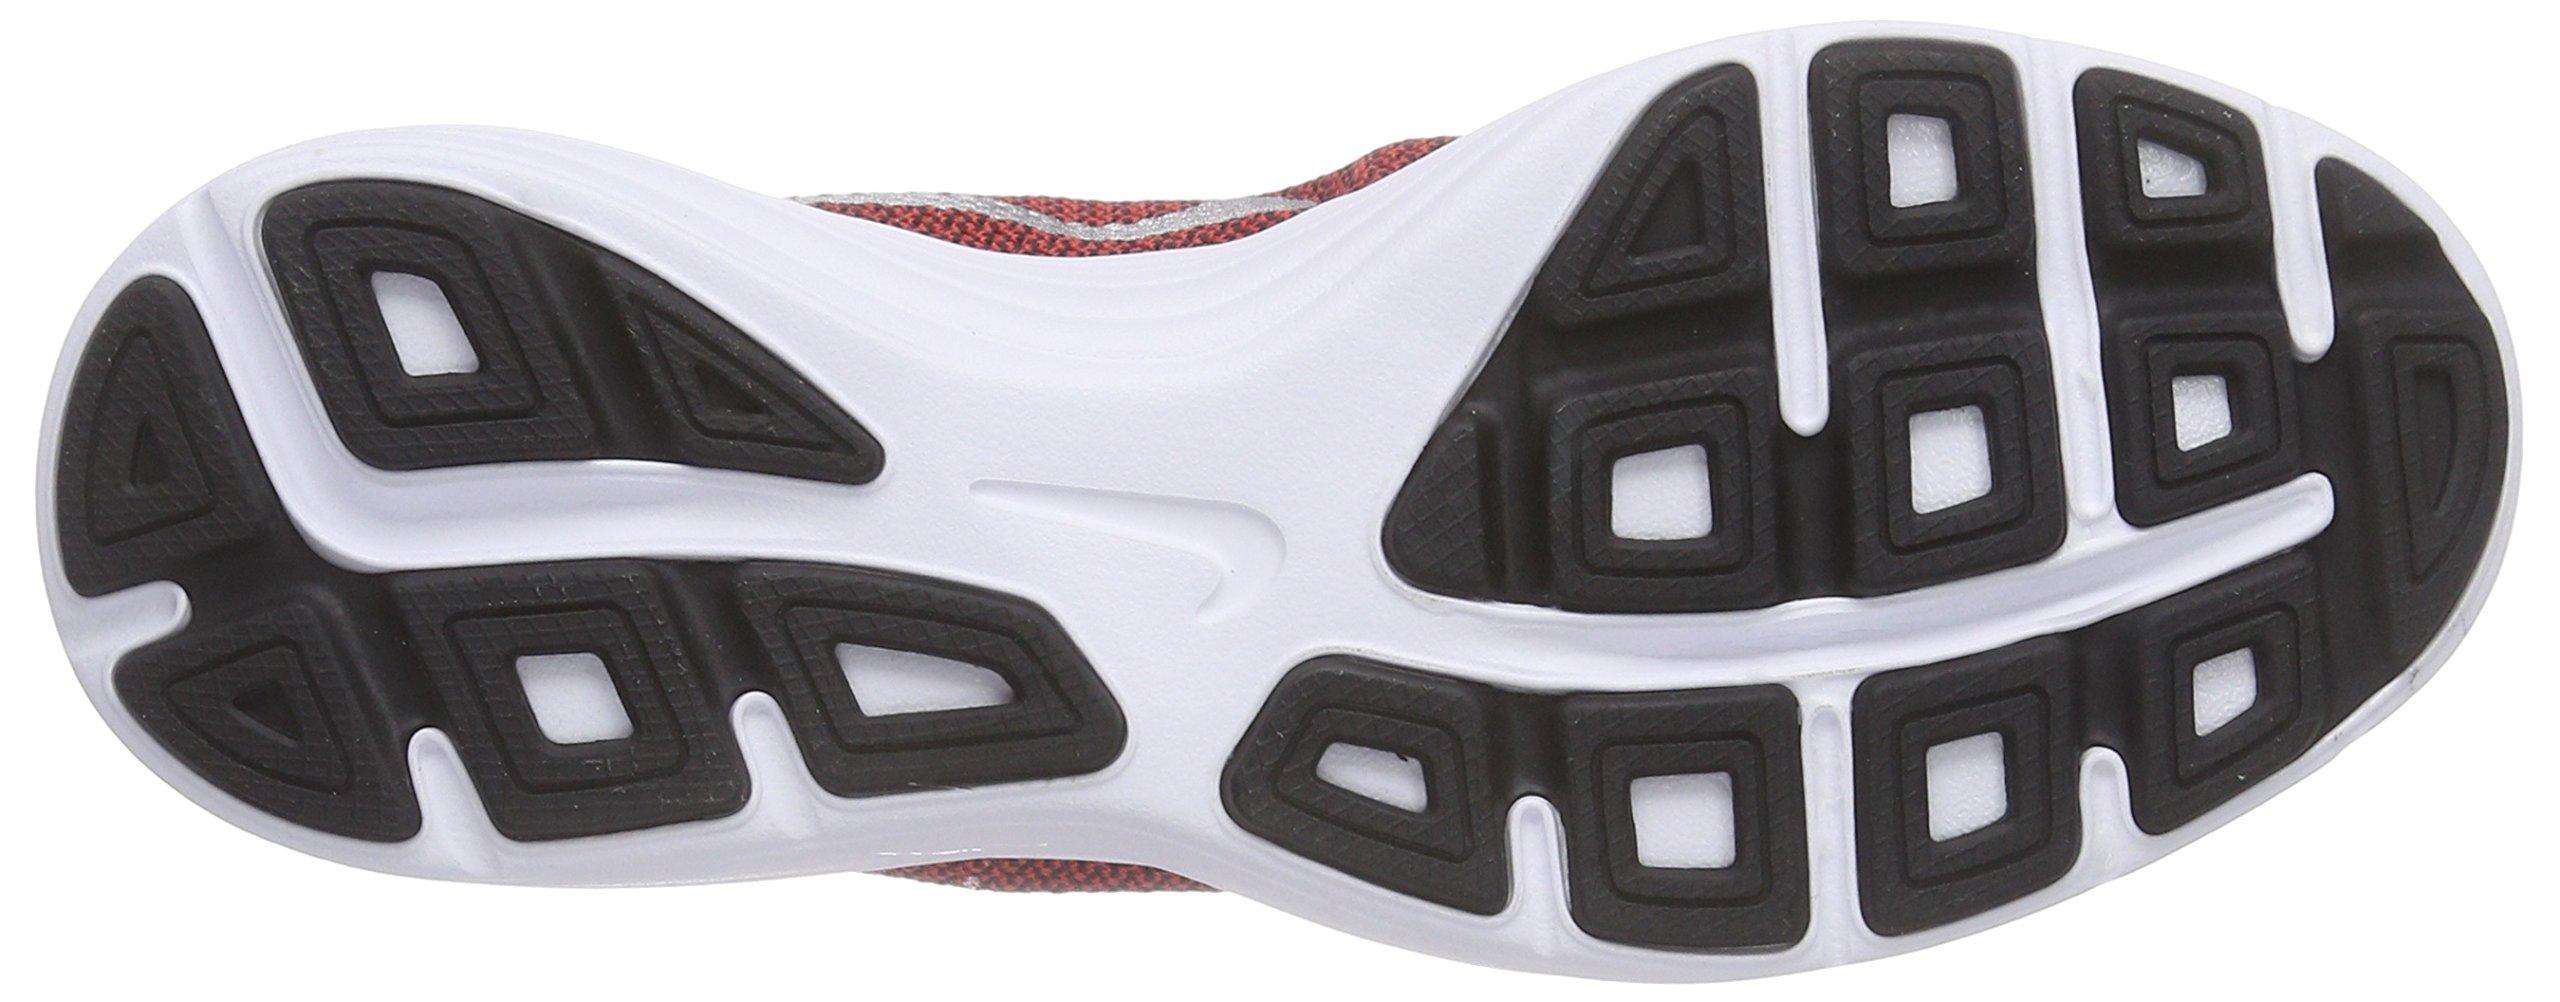 NIKE Boys' Revolution 3 Running Shoe (GS), University Red/Metallic Silver/Black, 4 M US Big Kid by Nike (Image #3)